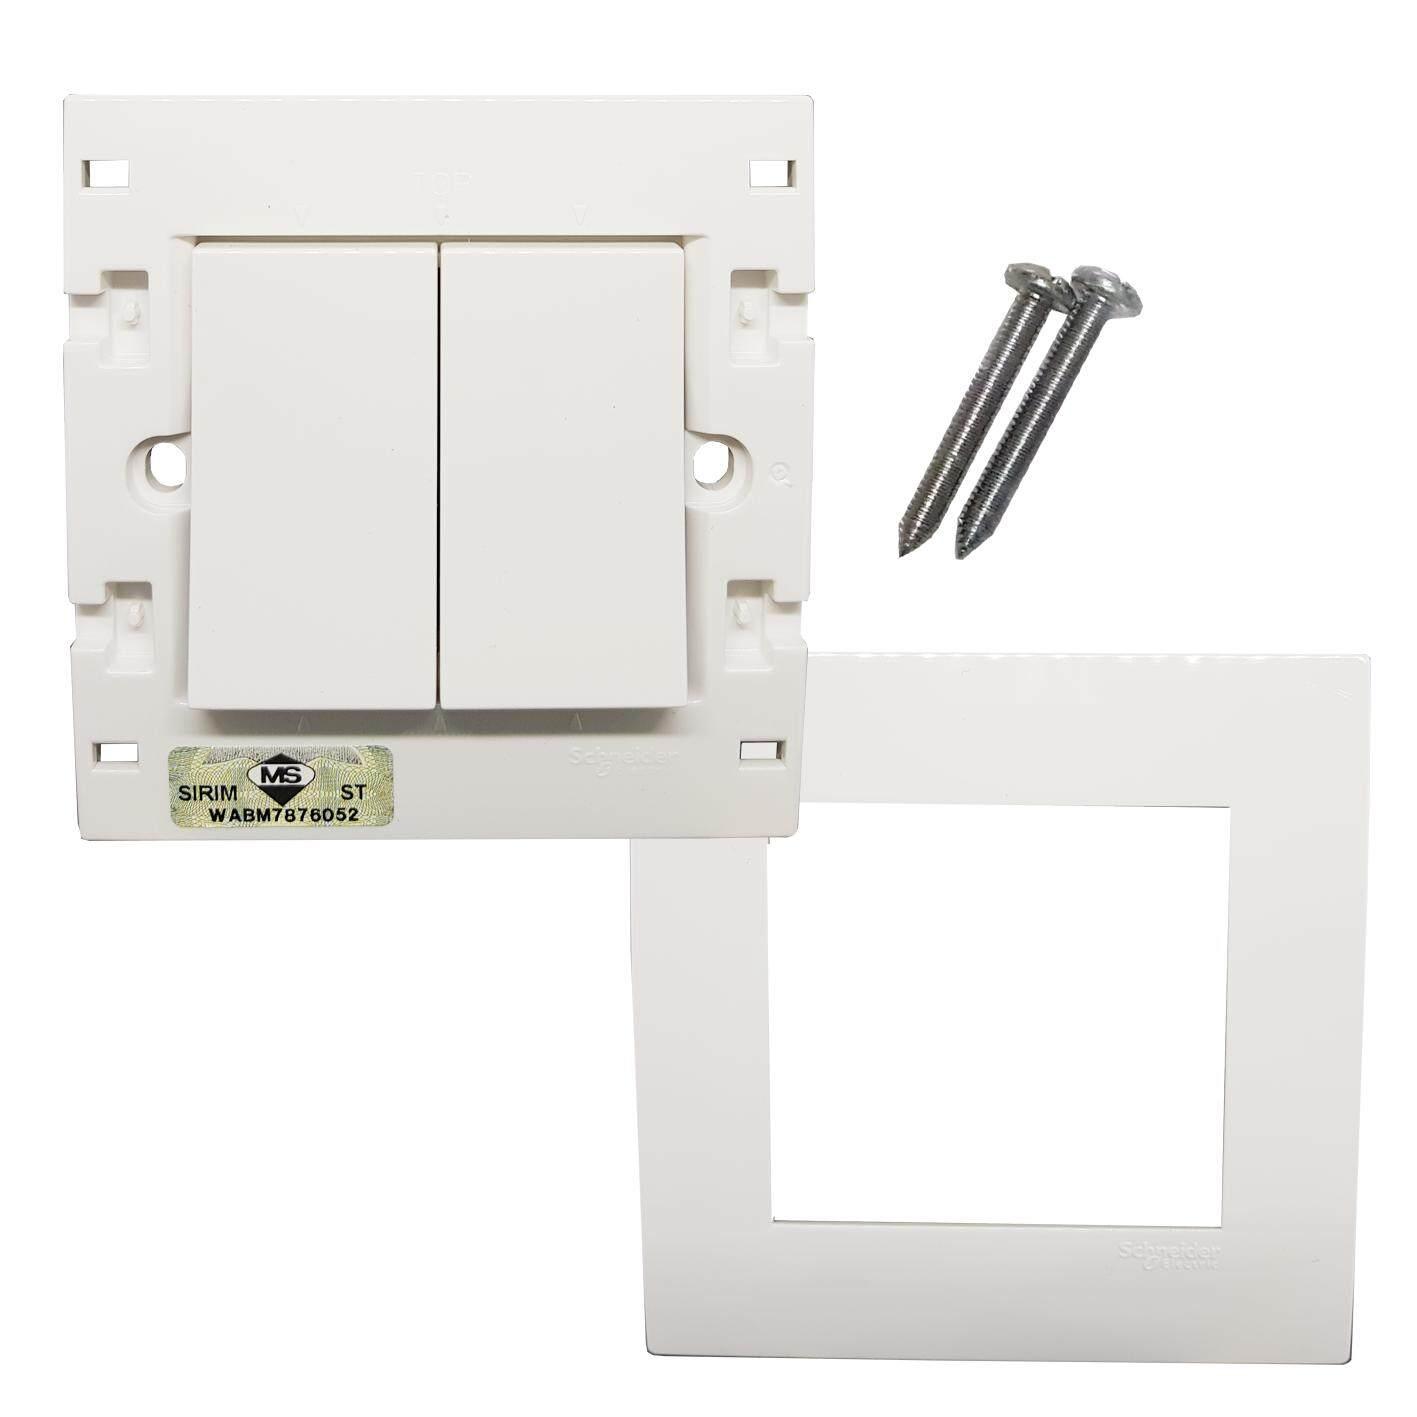 Mcb Schneider Electric 10a 1phase Domae Berkualitas Cek Harga Rcbo Slim 1p N Vivace Kb32bp We G11 250v 2 Gang Press Switch White 3